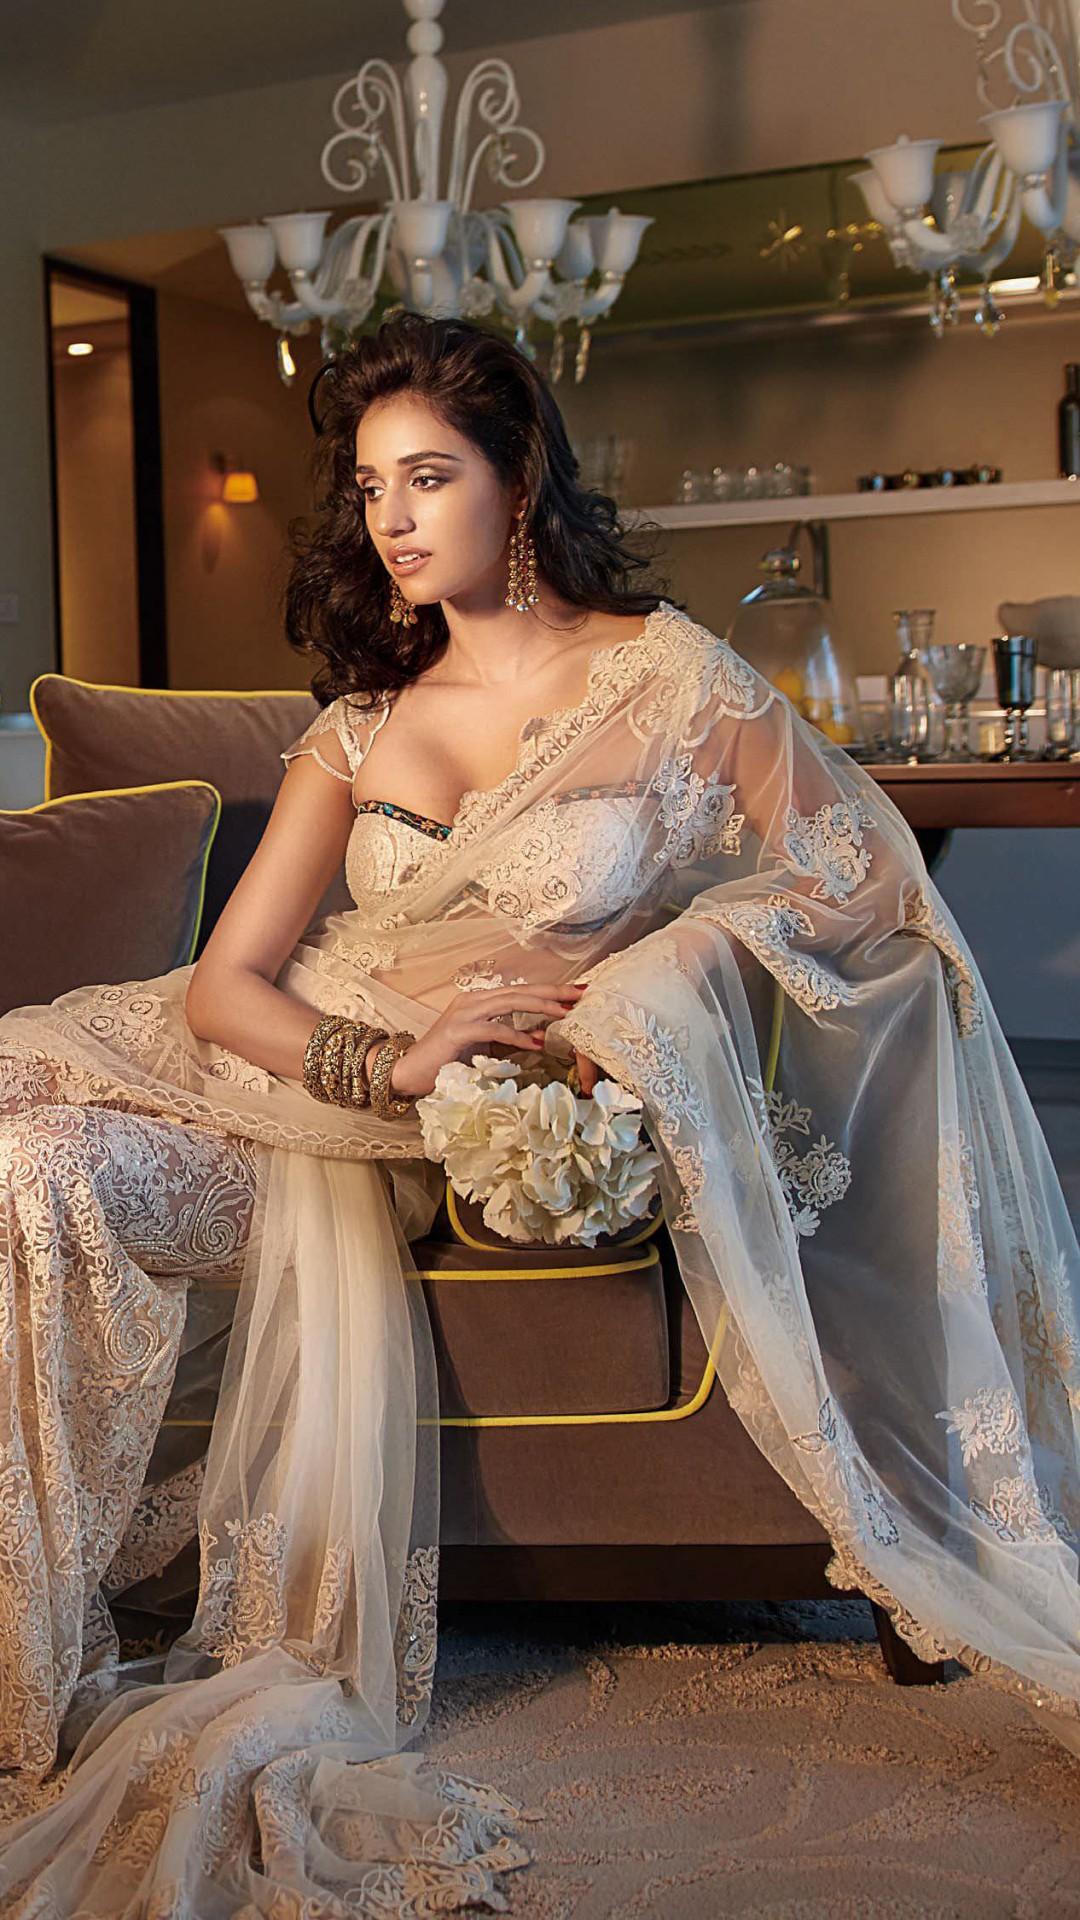 Wallpaper Disha Patani Photo 4k Bollywood Celebrities